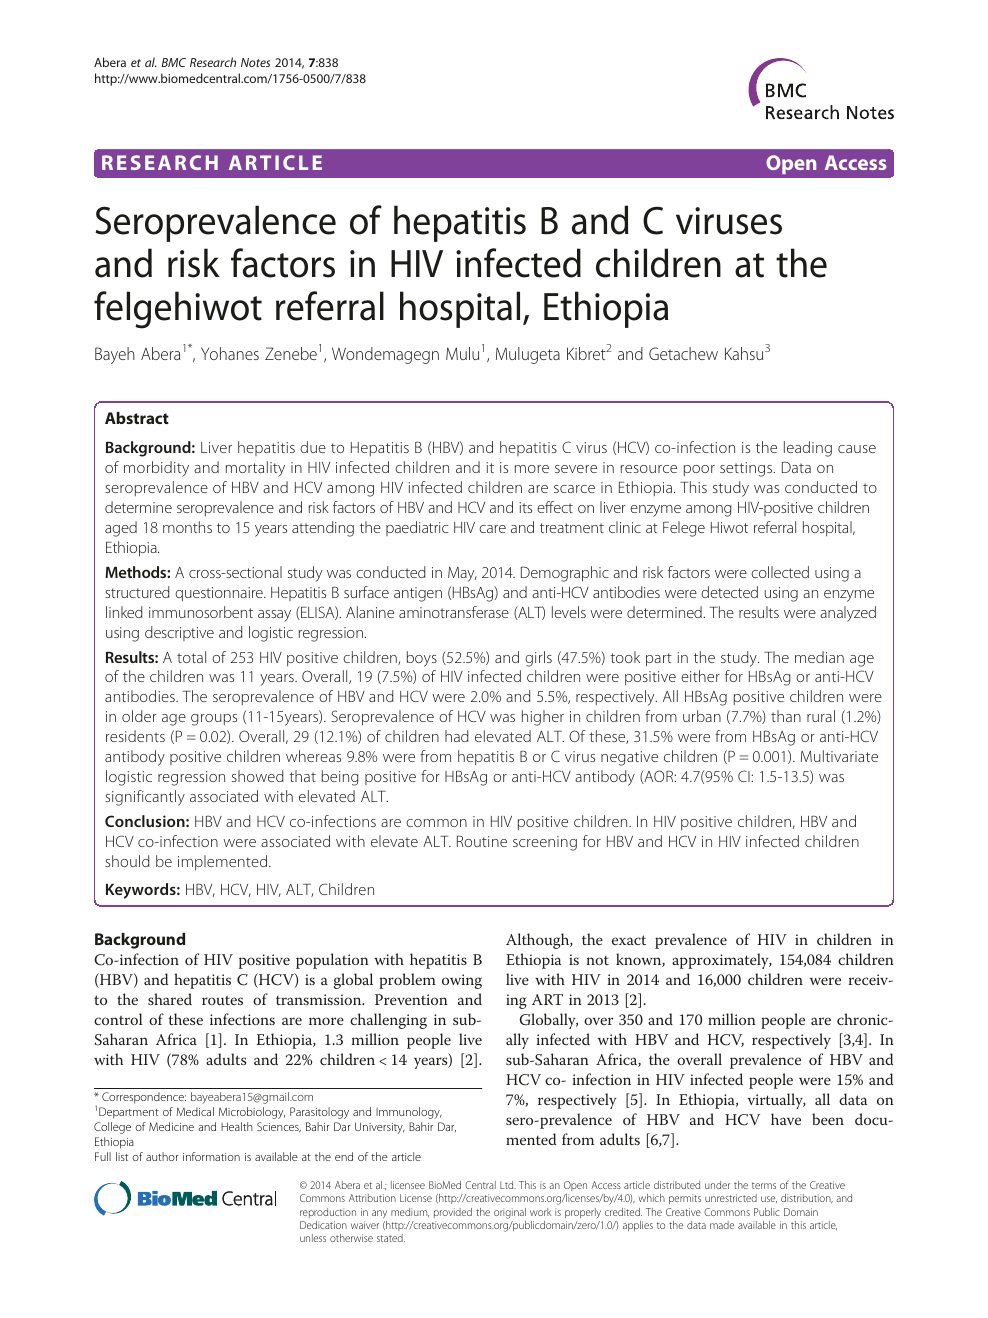 Seroprevalence of hepatitis B and C viruses and risk factors